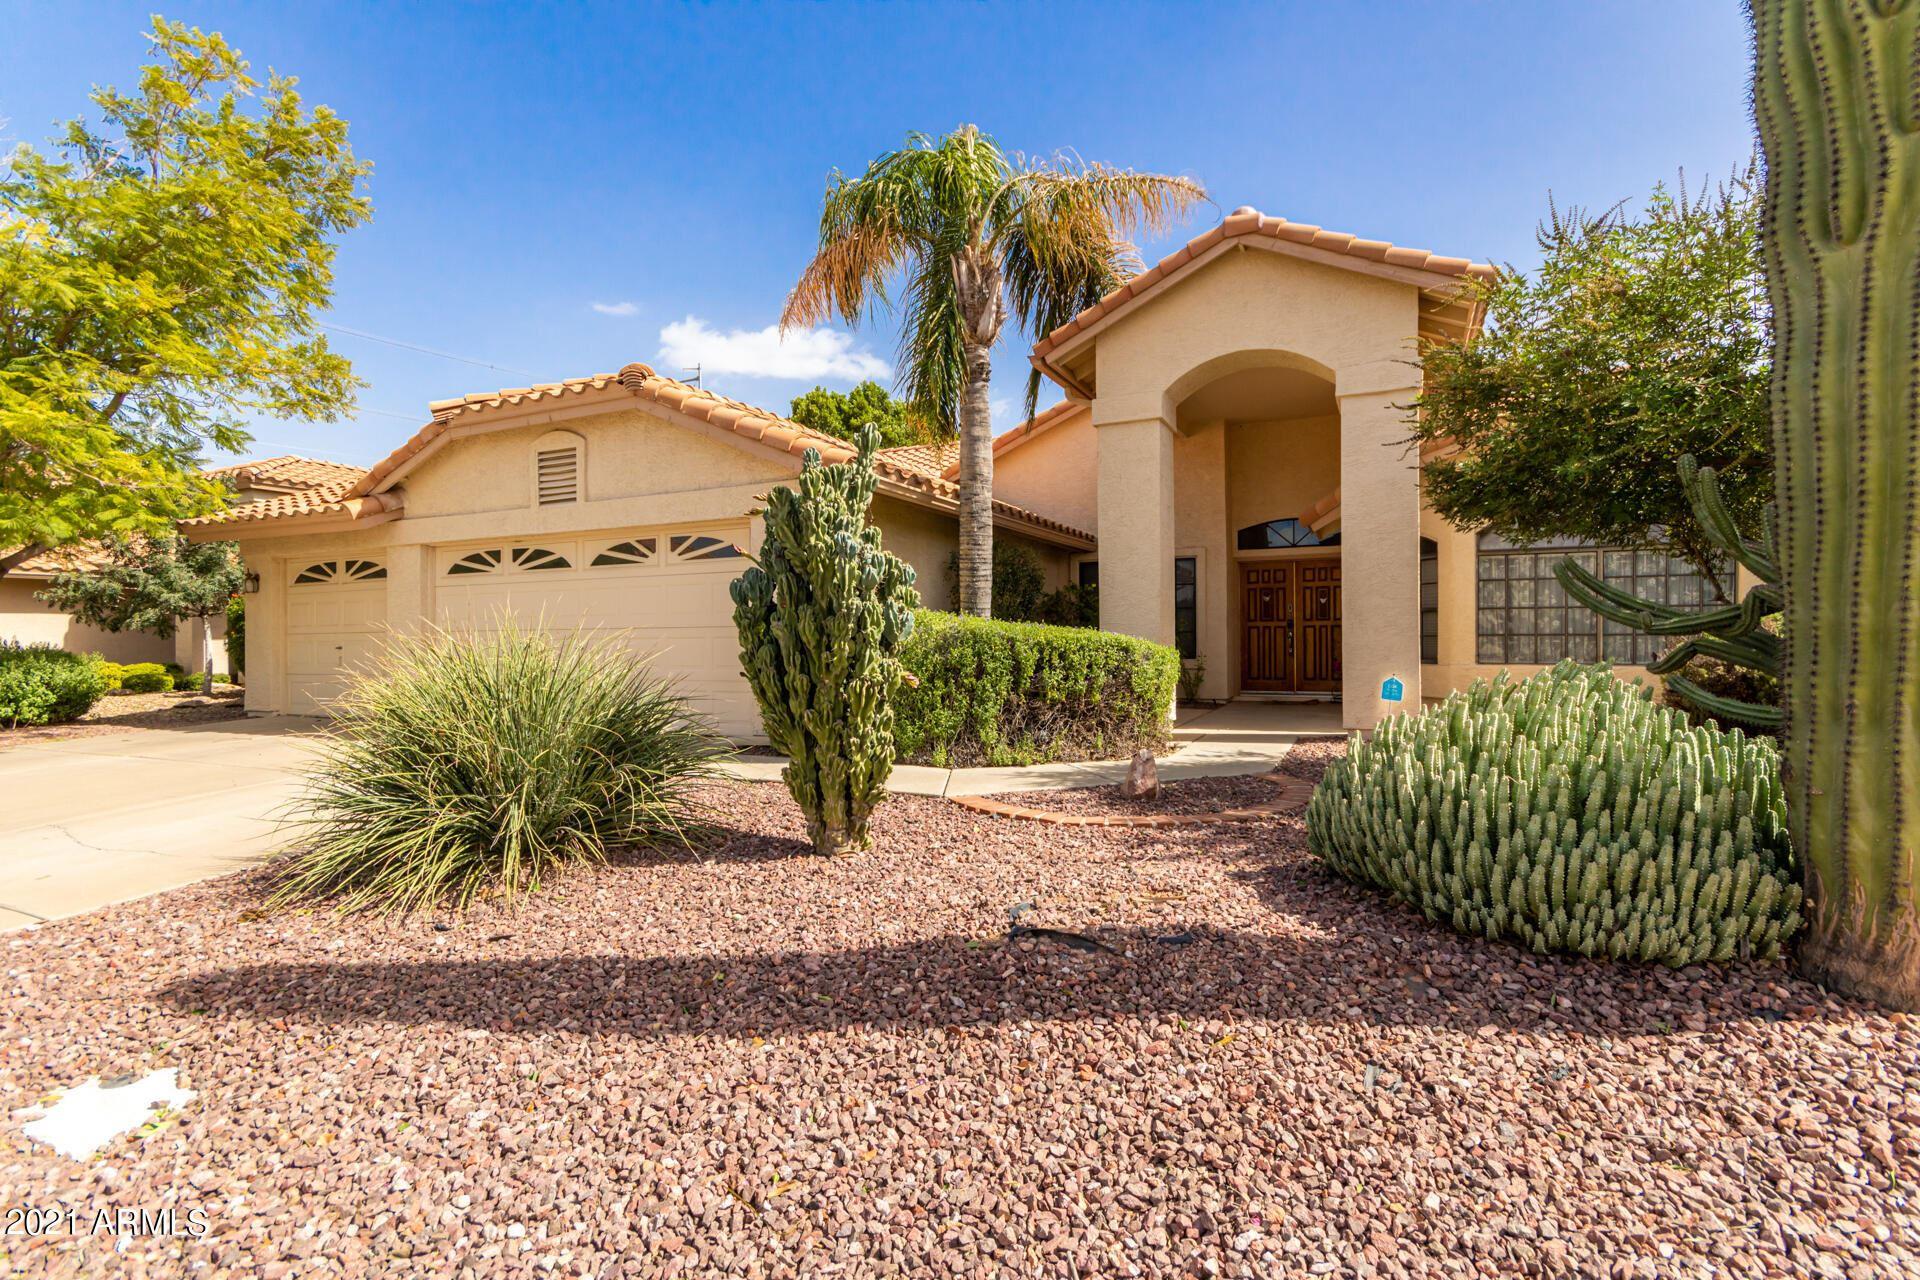 Photo of 319 N RIATA Street, Gilbert, AZ 85234 (MLS # 6307780)